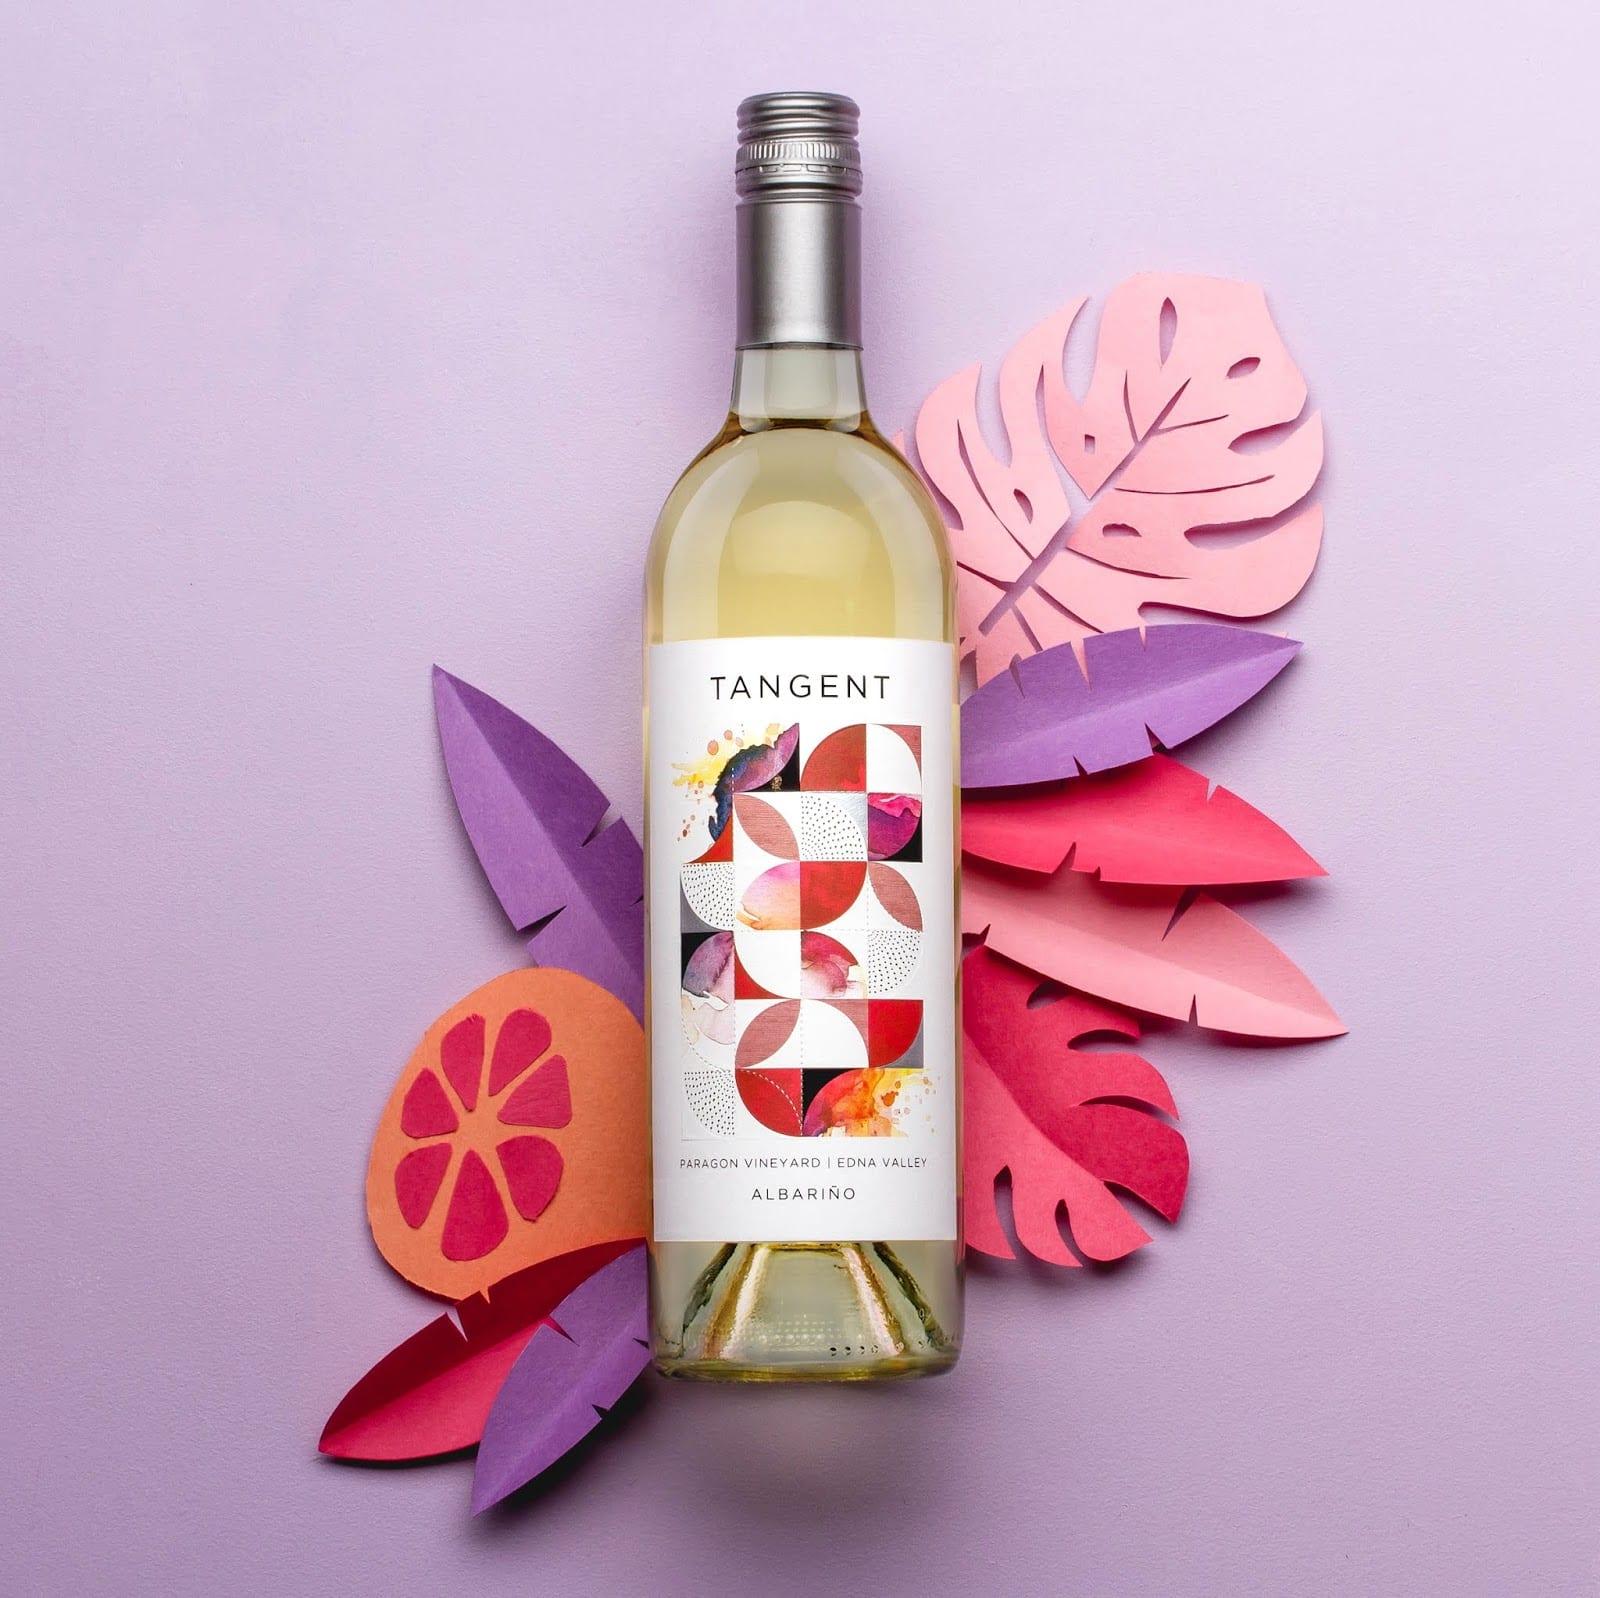 TANGENT img 3 - Redesign obalu Tangent Wines, populárních vín z Kalifornie